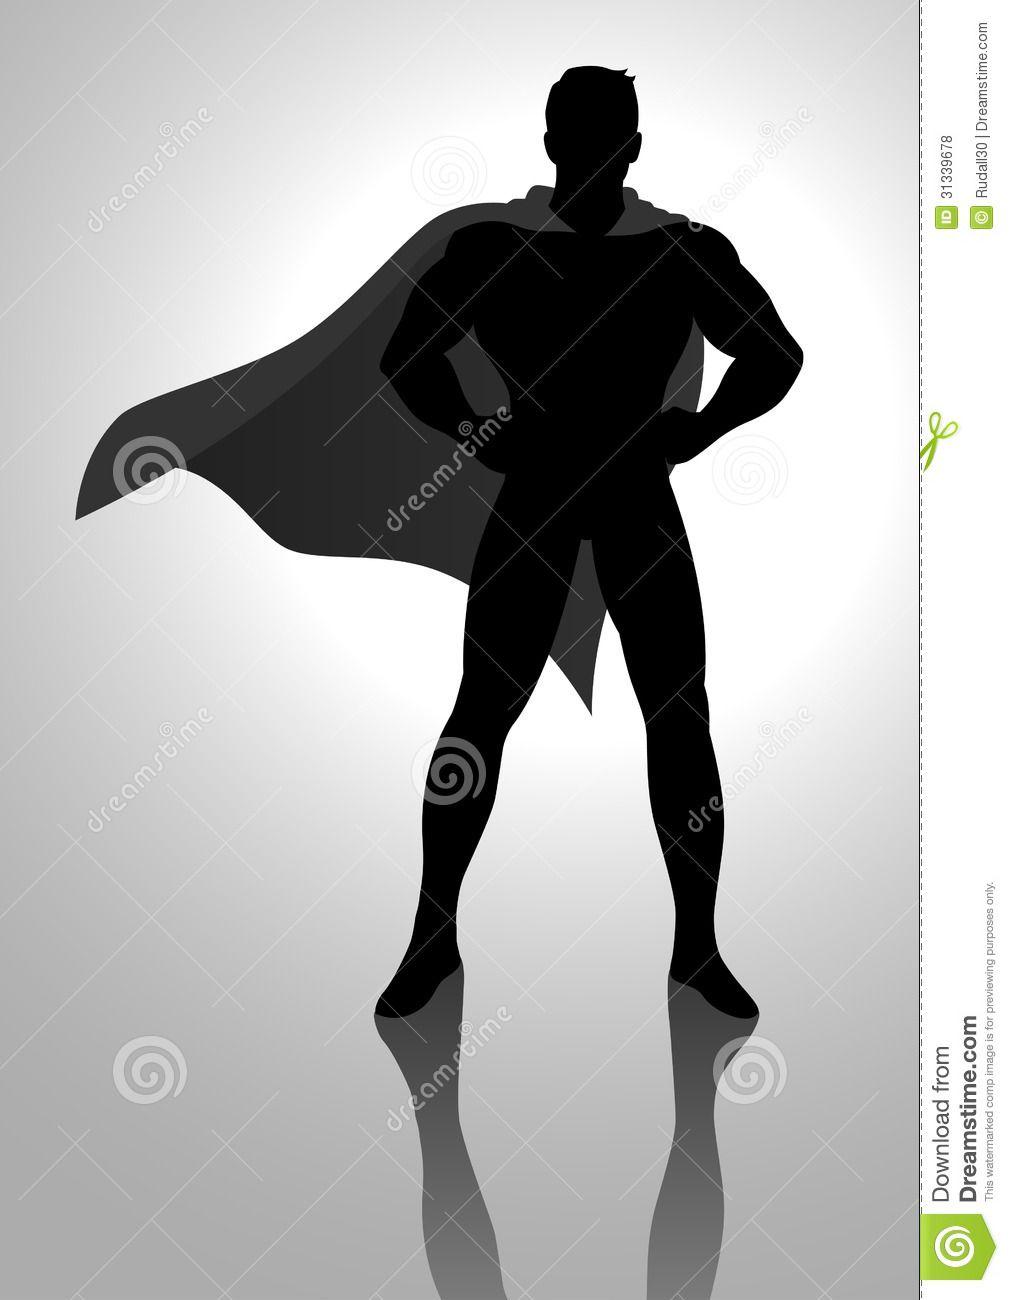 superhero-silhouette-illustration-heroic-pose-31339678.jpg ...